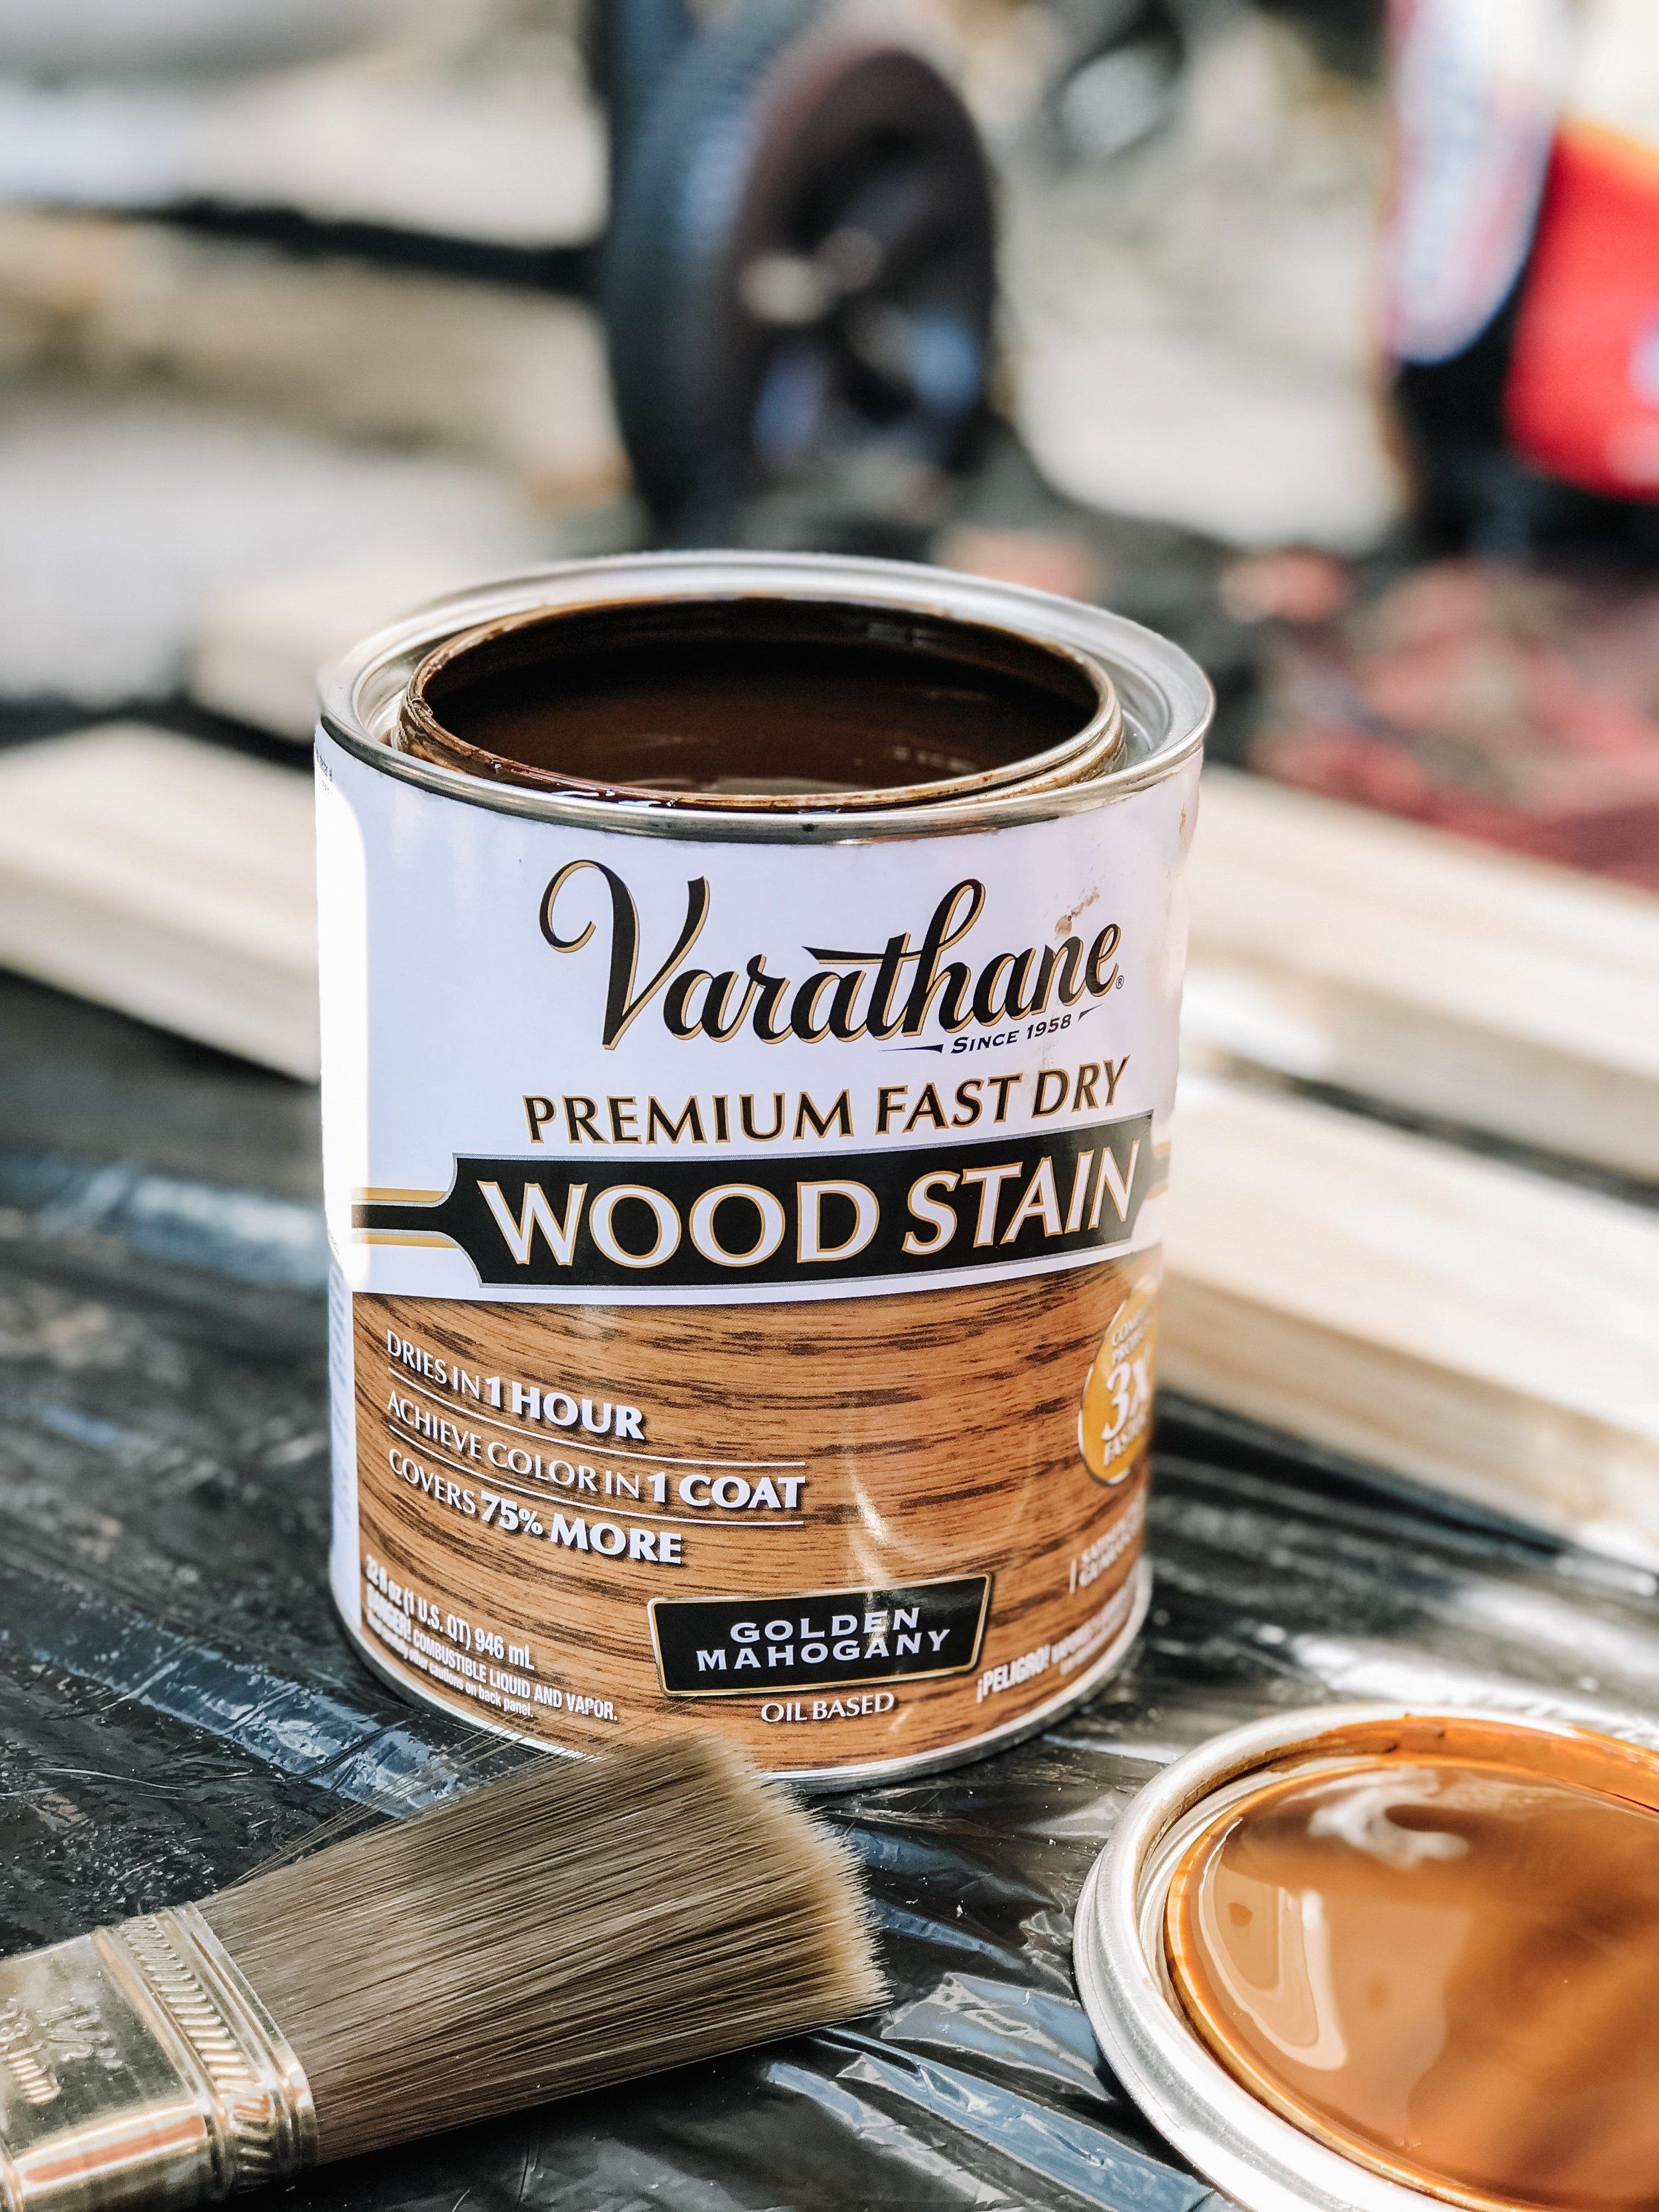 Menards-Varathane-Wood-Stain-Diy-blanket-ladder-project.jpg